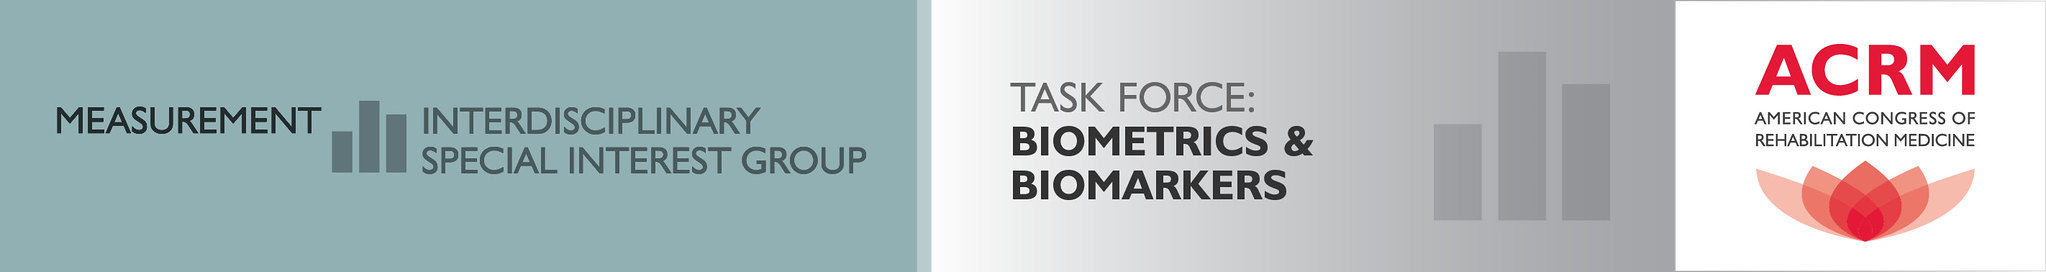 ACRM Measurement ISIG Biometrics & Biomarkers Task Force banner